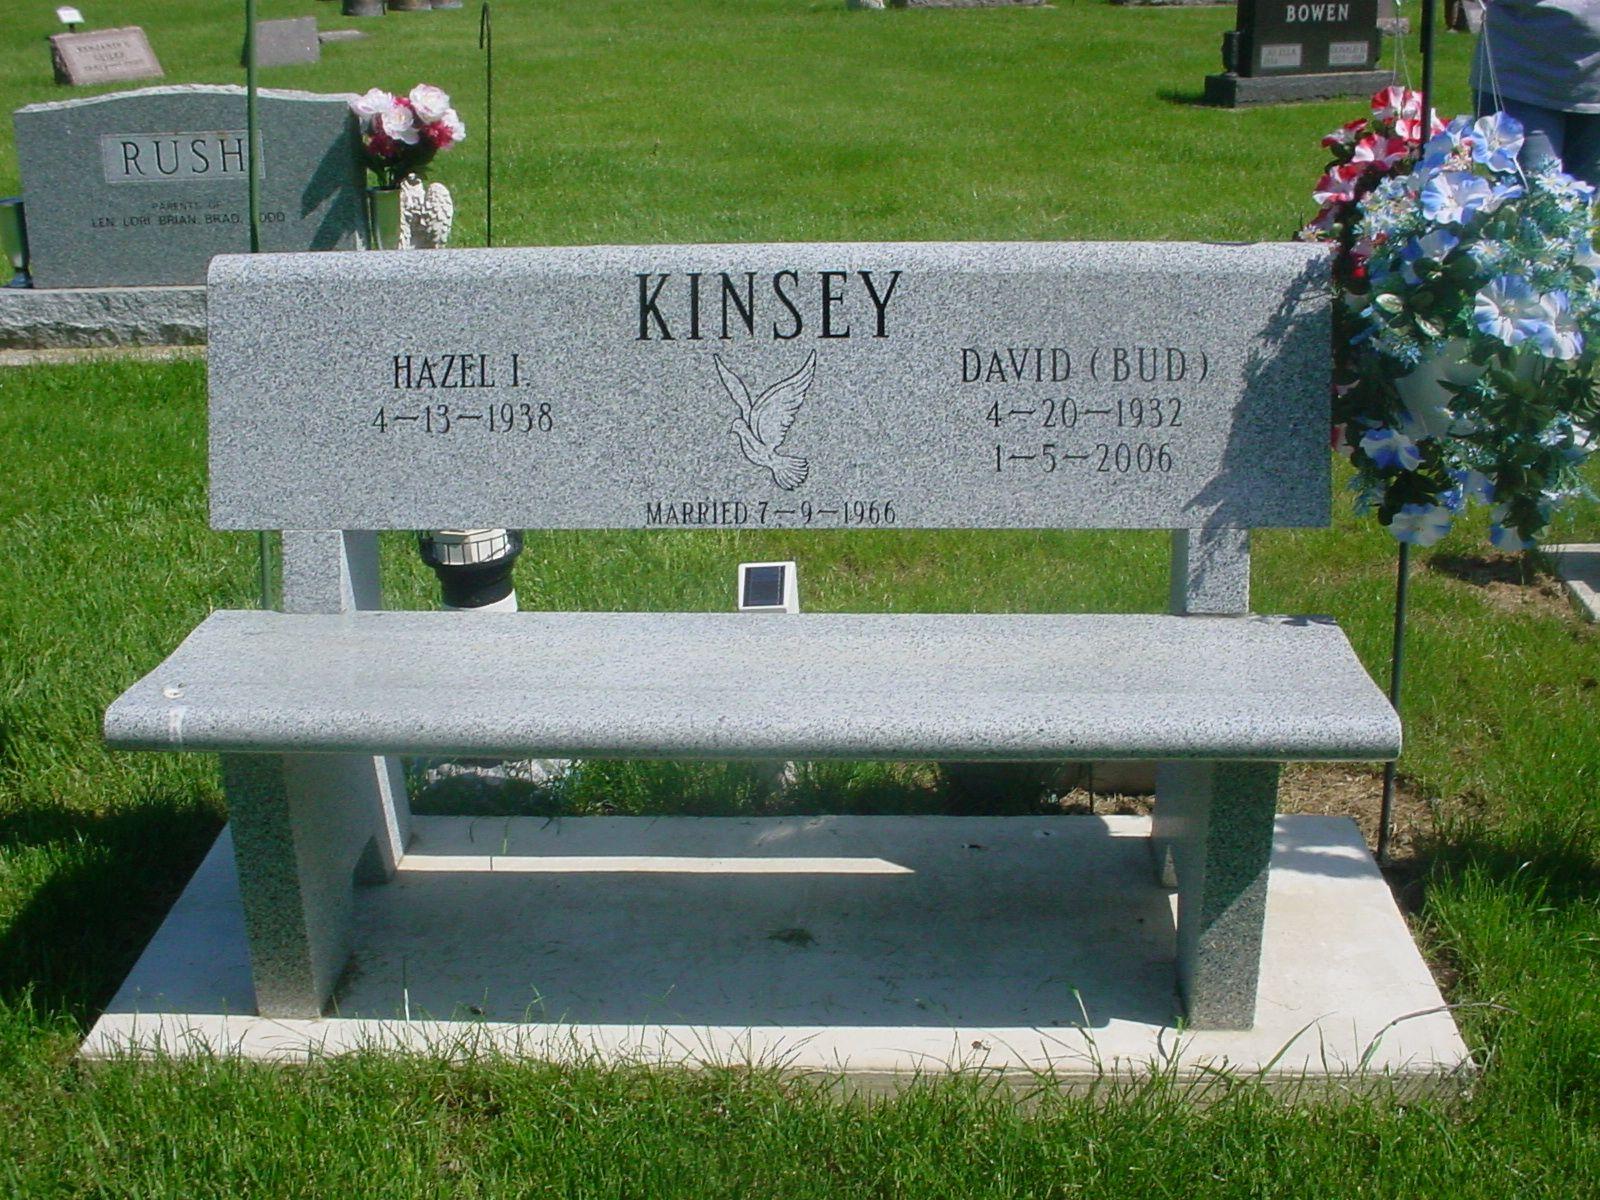 The Gravestone That I Want Memorial Benches Memorial Garden Grave Marker